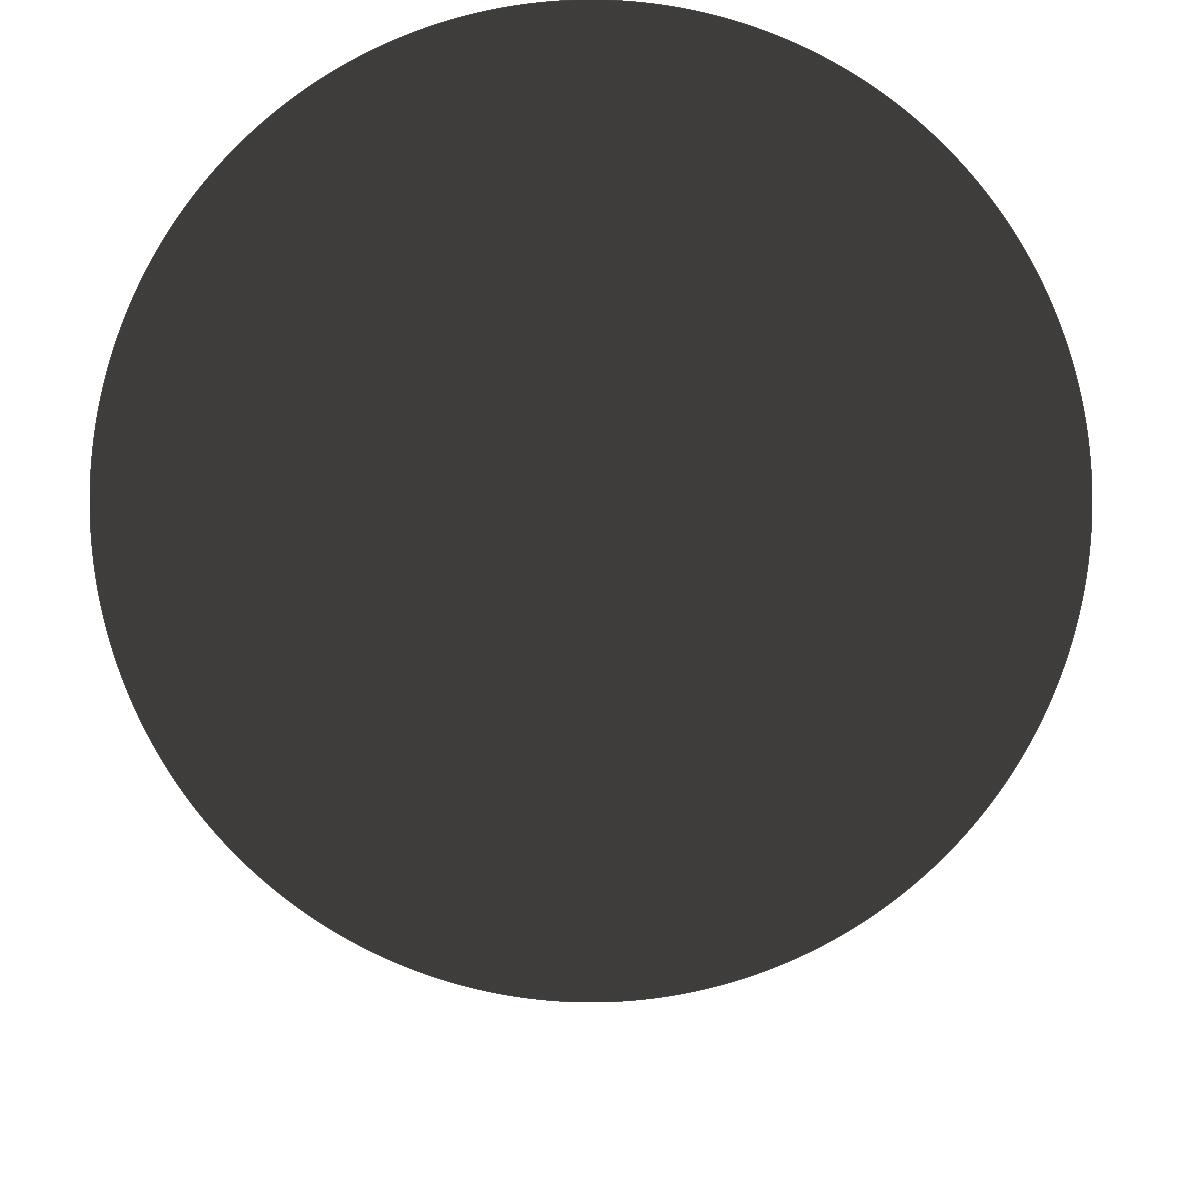 C.I. Black 7(MOL8700) -